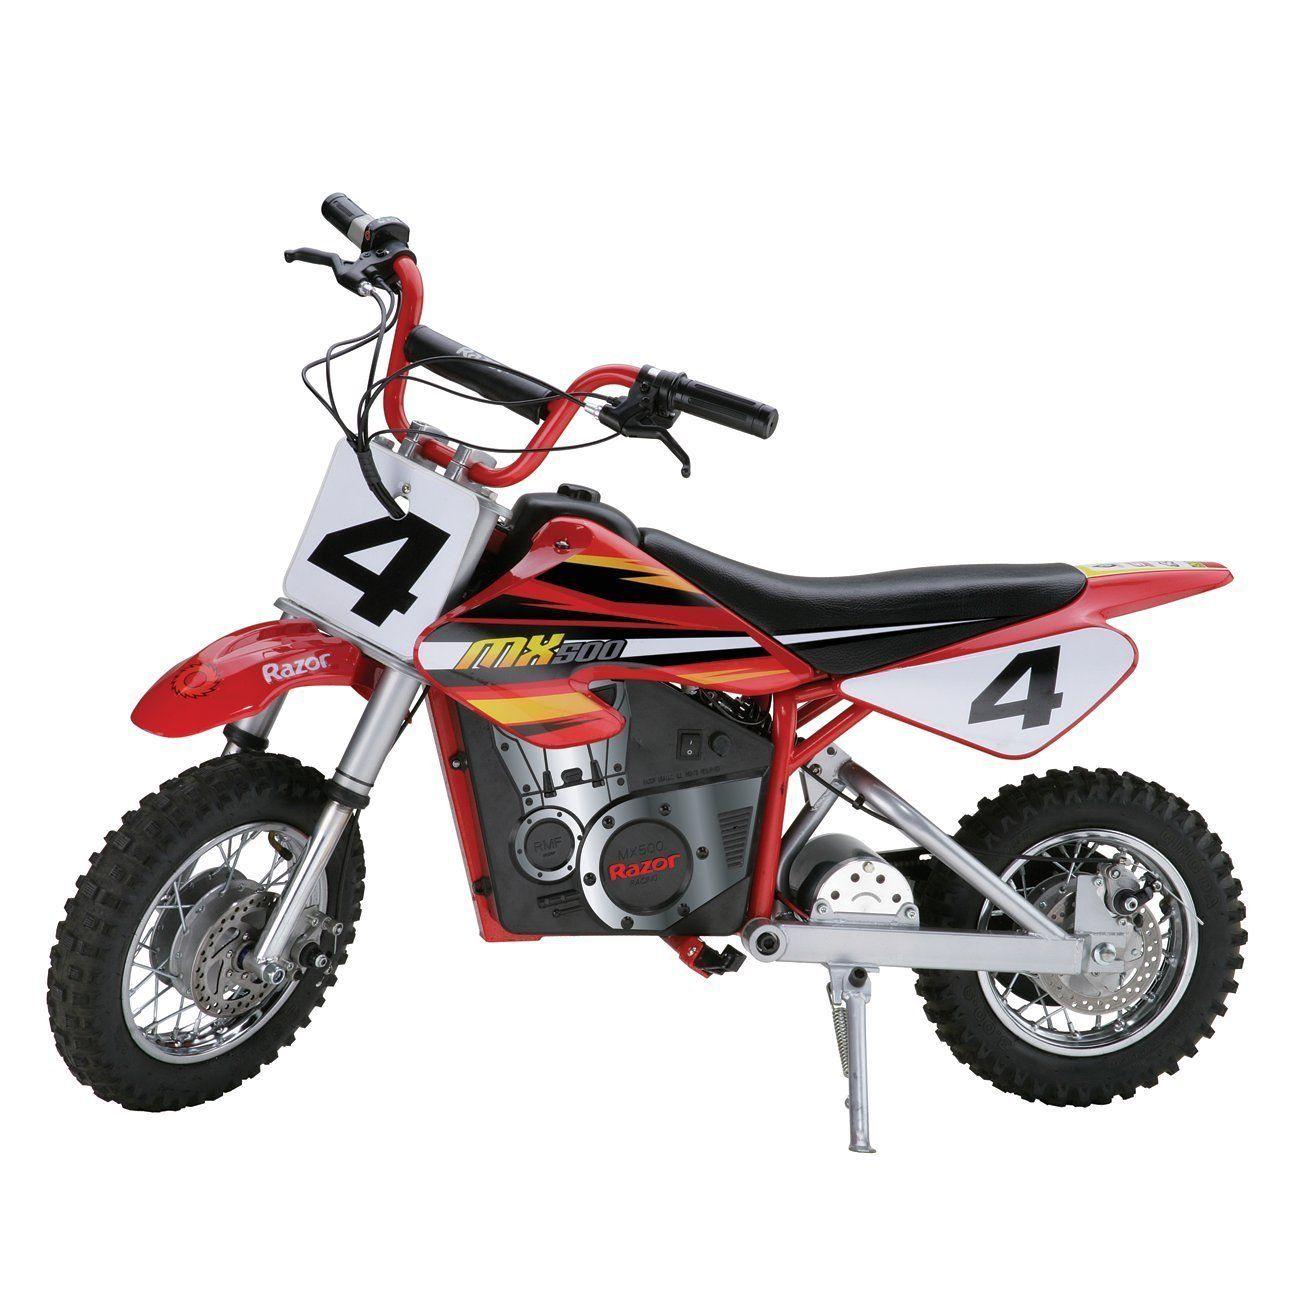 Razor Mx500 Dirt Rocket Electric Motocross Bike Ultimate Review Mydirtbike Com The Home Of Hot Dirtbikes Electric Bike For Kids Cool Dirt Bikes Motocross Bikes